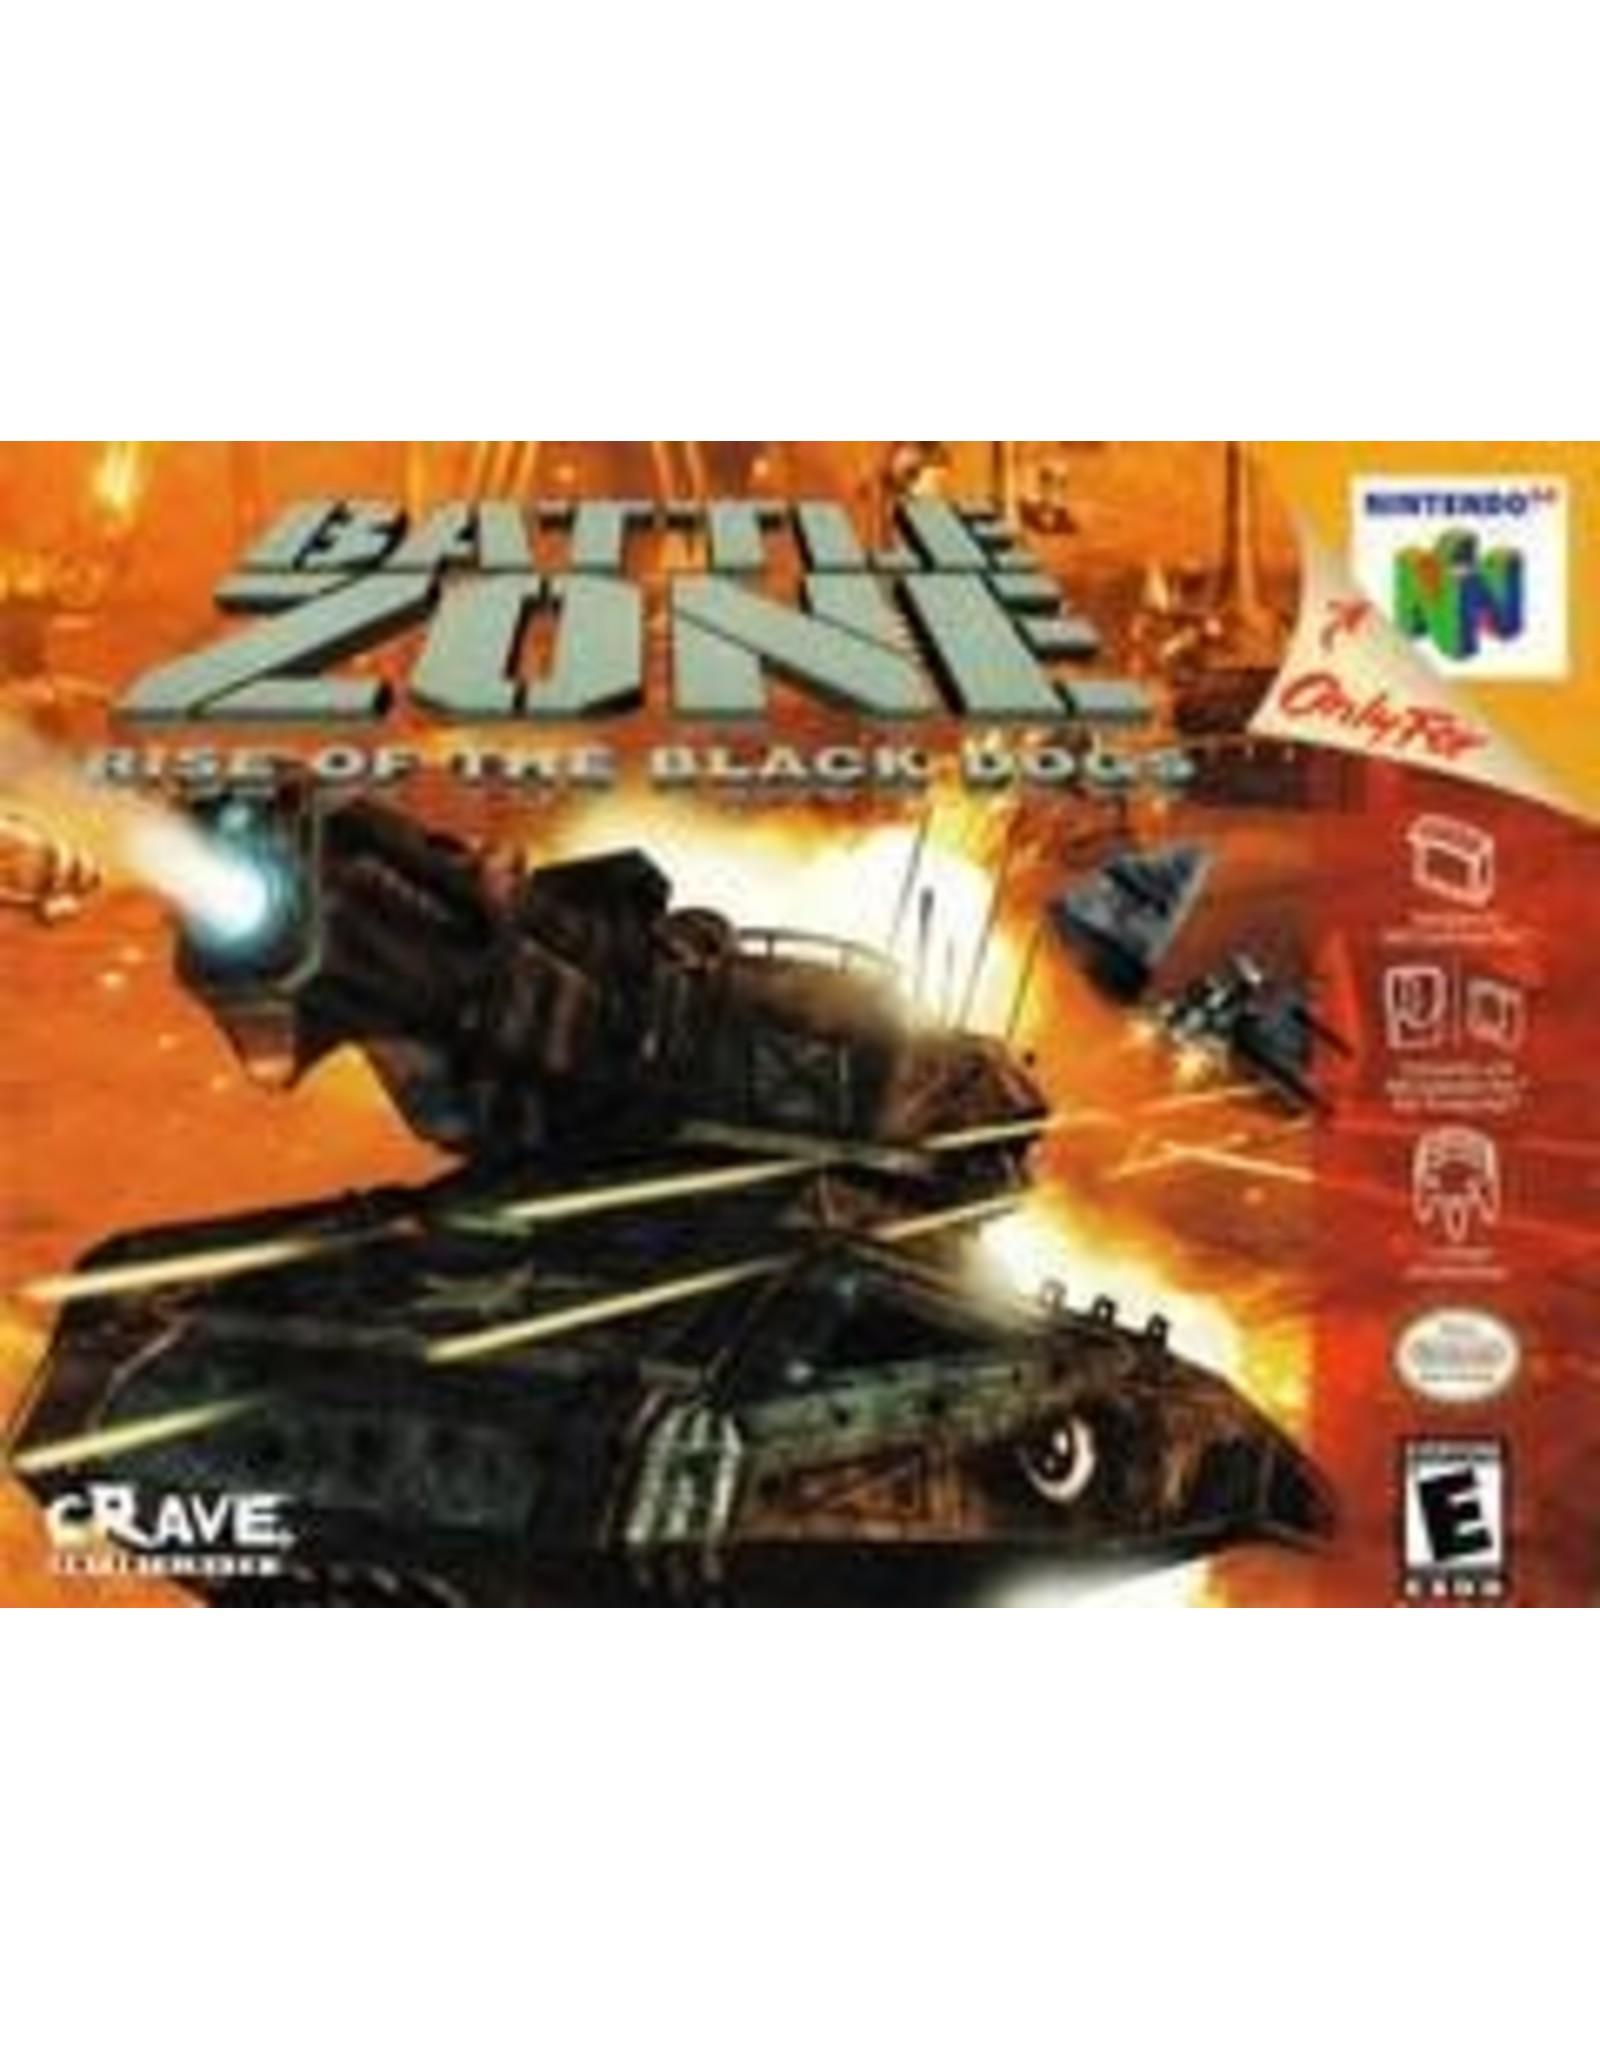 Nintendo 64 Battlezone: Rise of the Black Dogs (CiB)